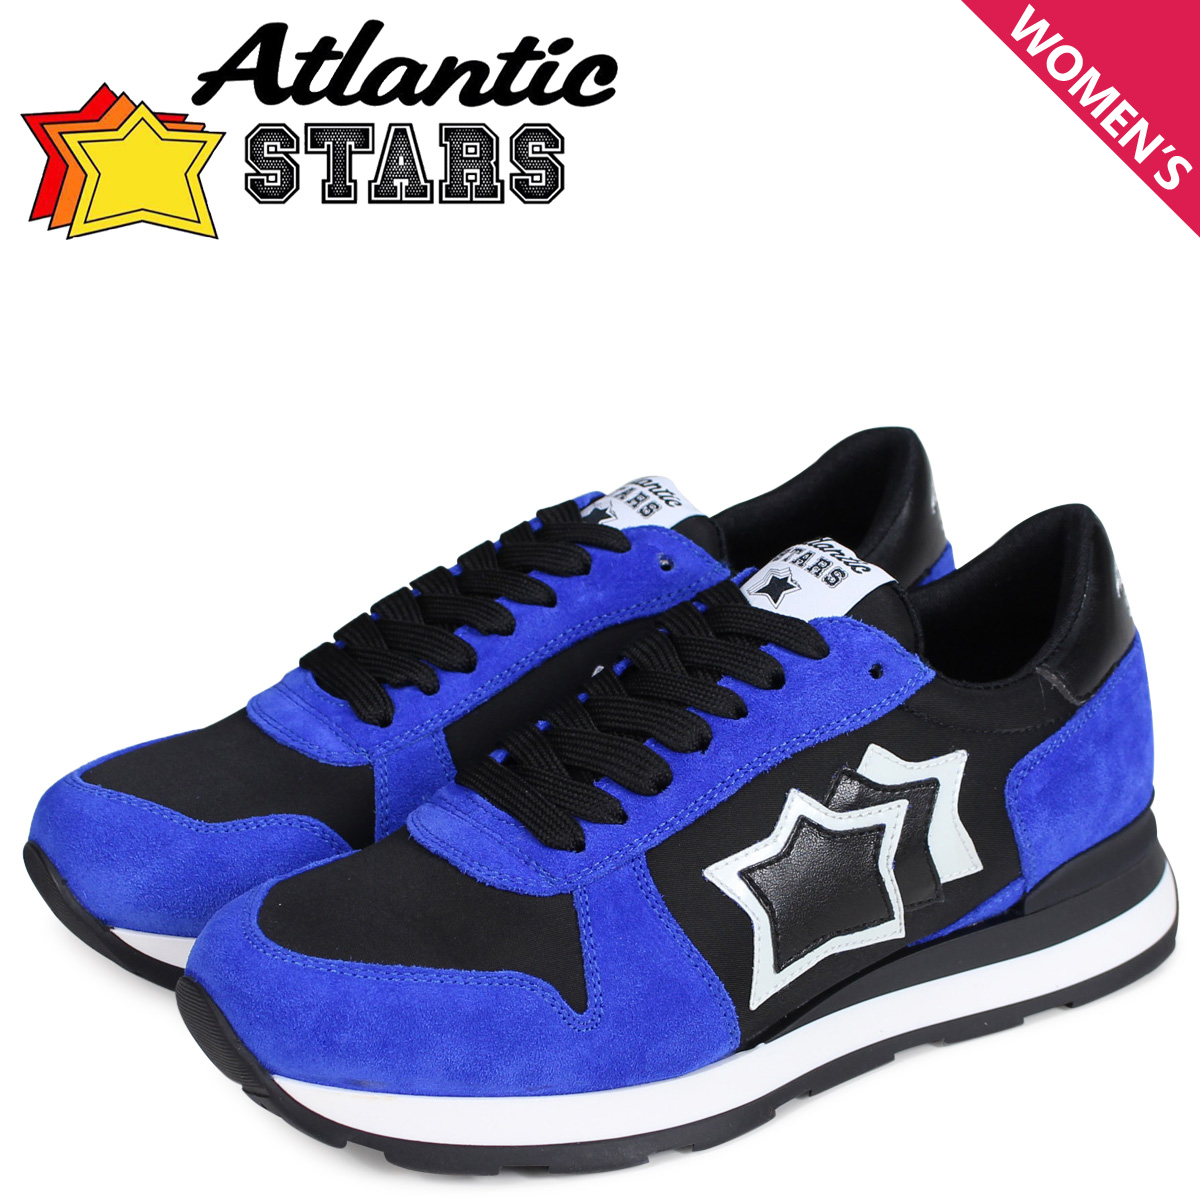 Atlantic STARS レディース スニーカー アトランティックスターズ ジェンマ GEMMA NF-10N ブルー